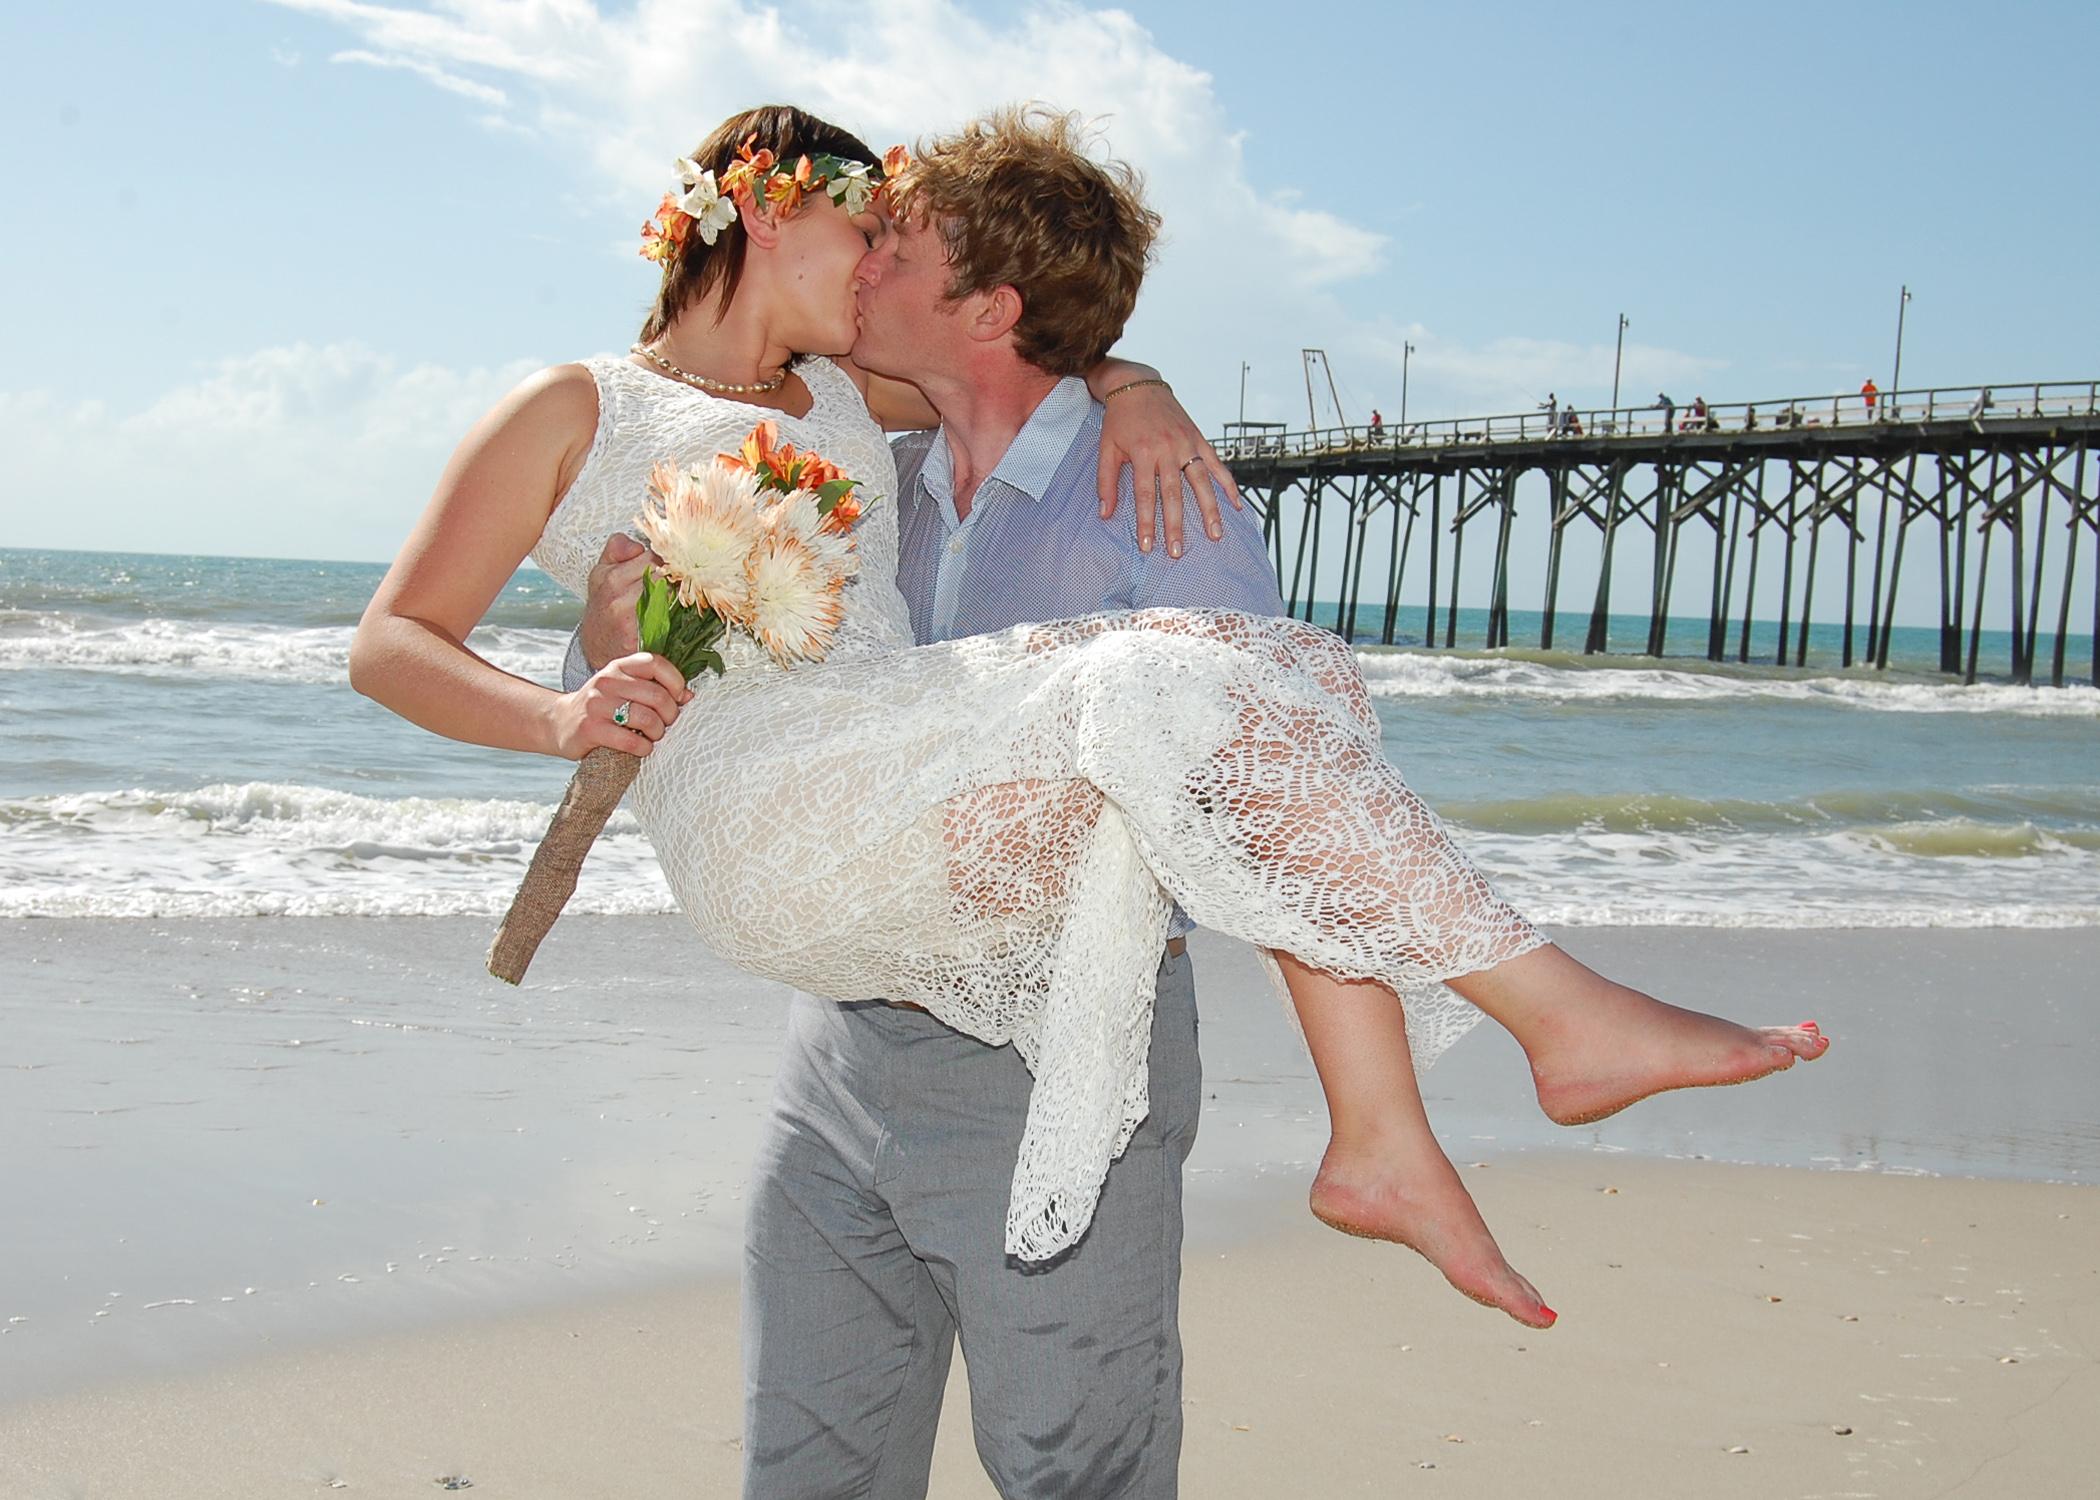 Groom picks up bride at beach.